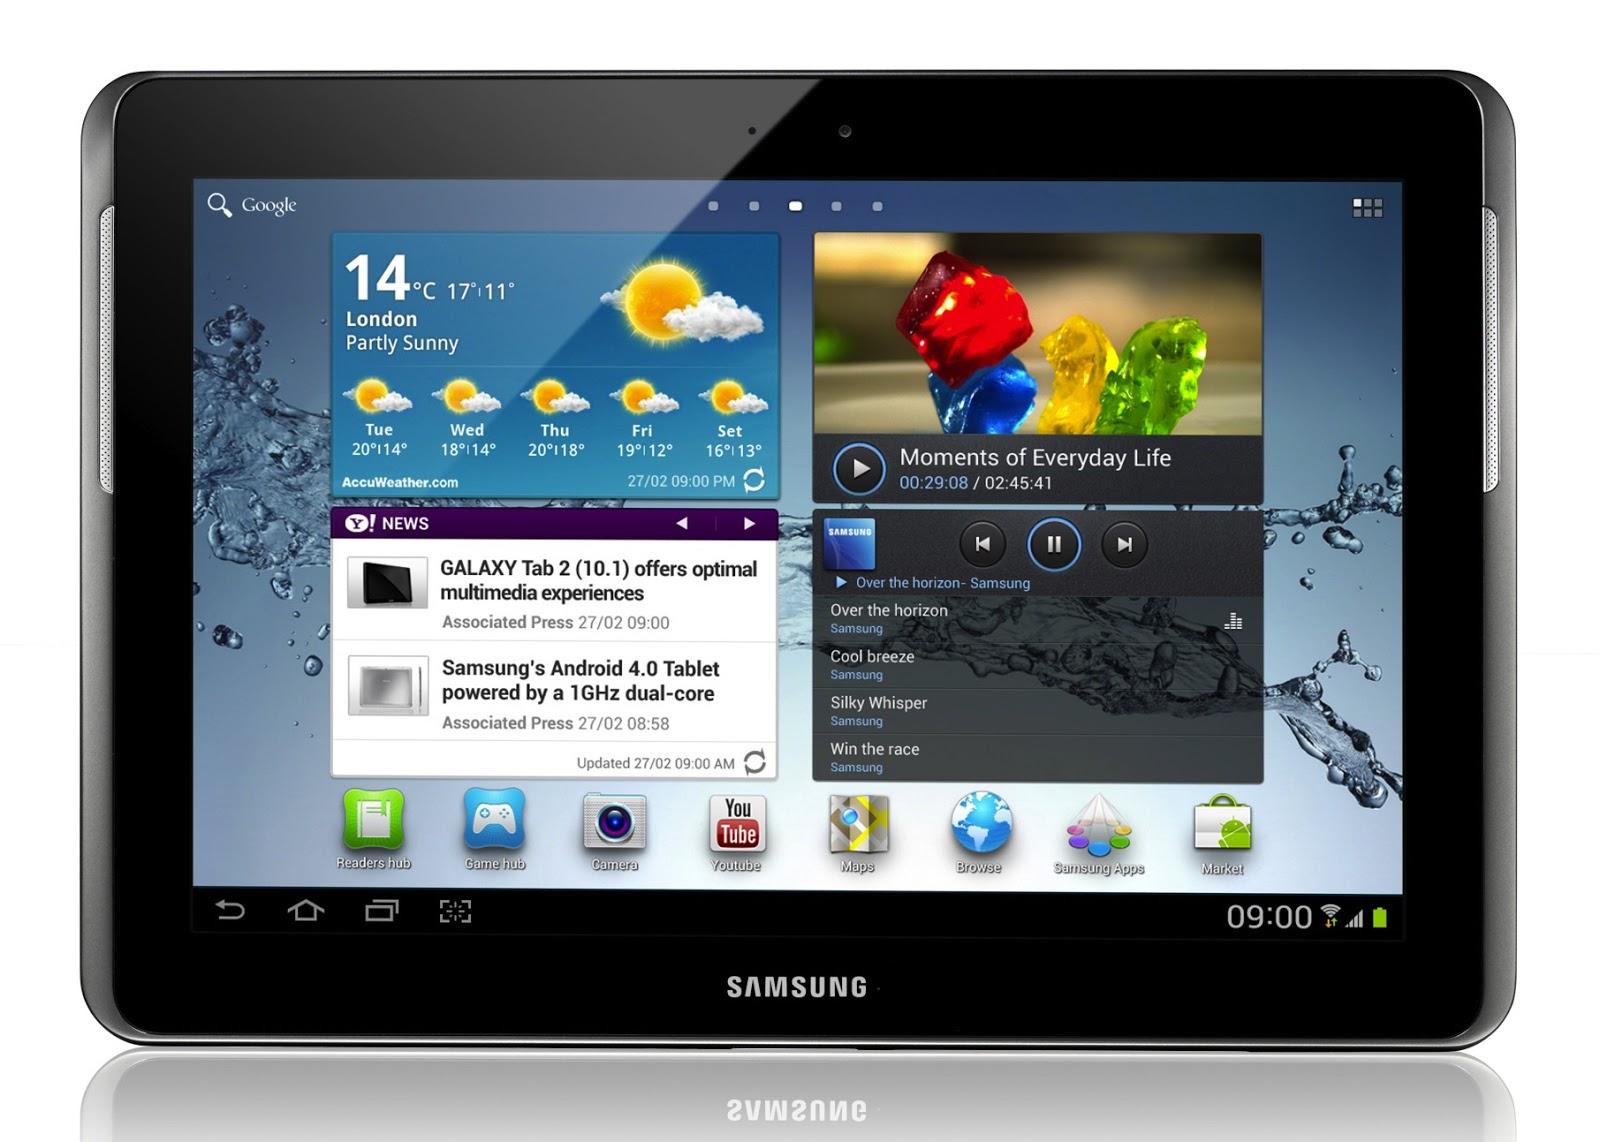 Best Custom Rom for Galaxy Tab 2 7 0 P3100 with SlimBean